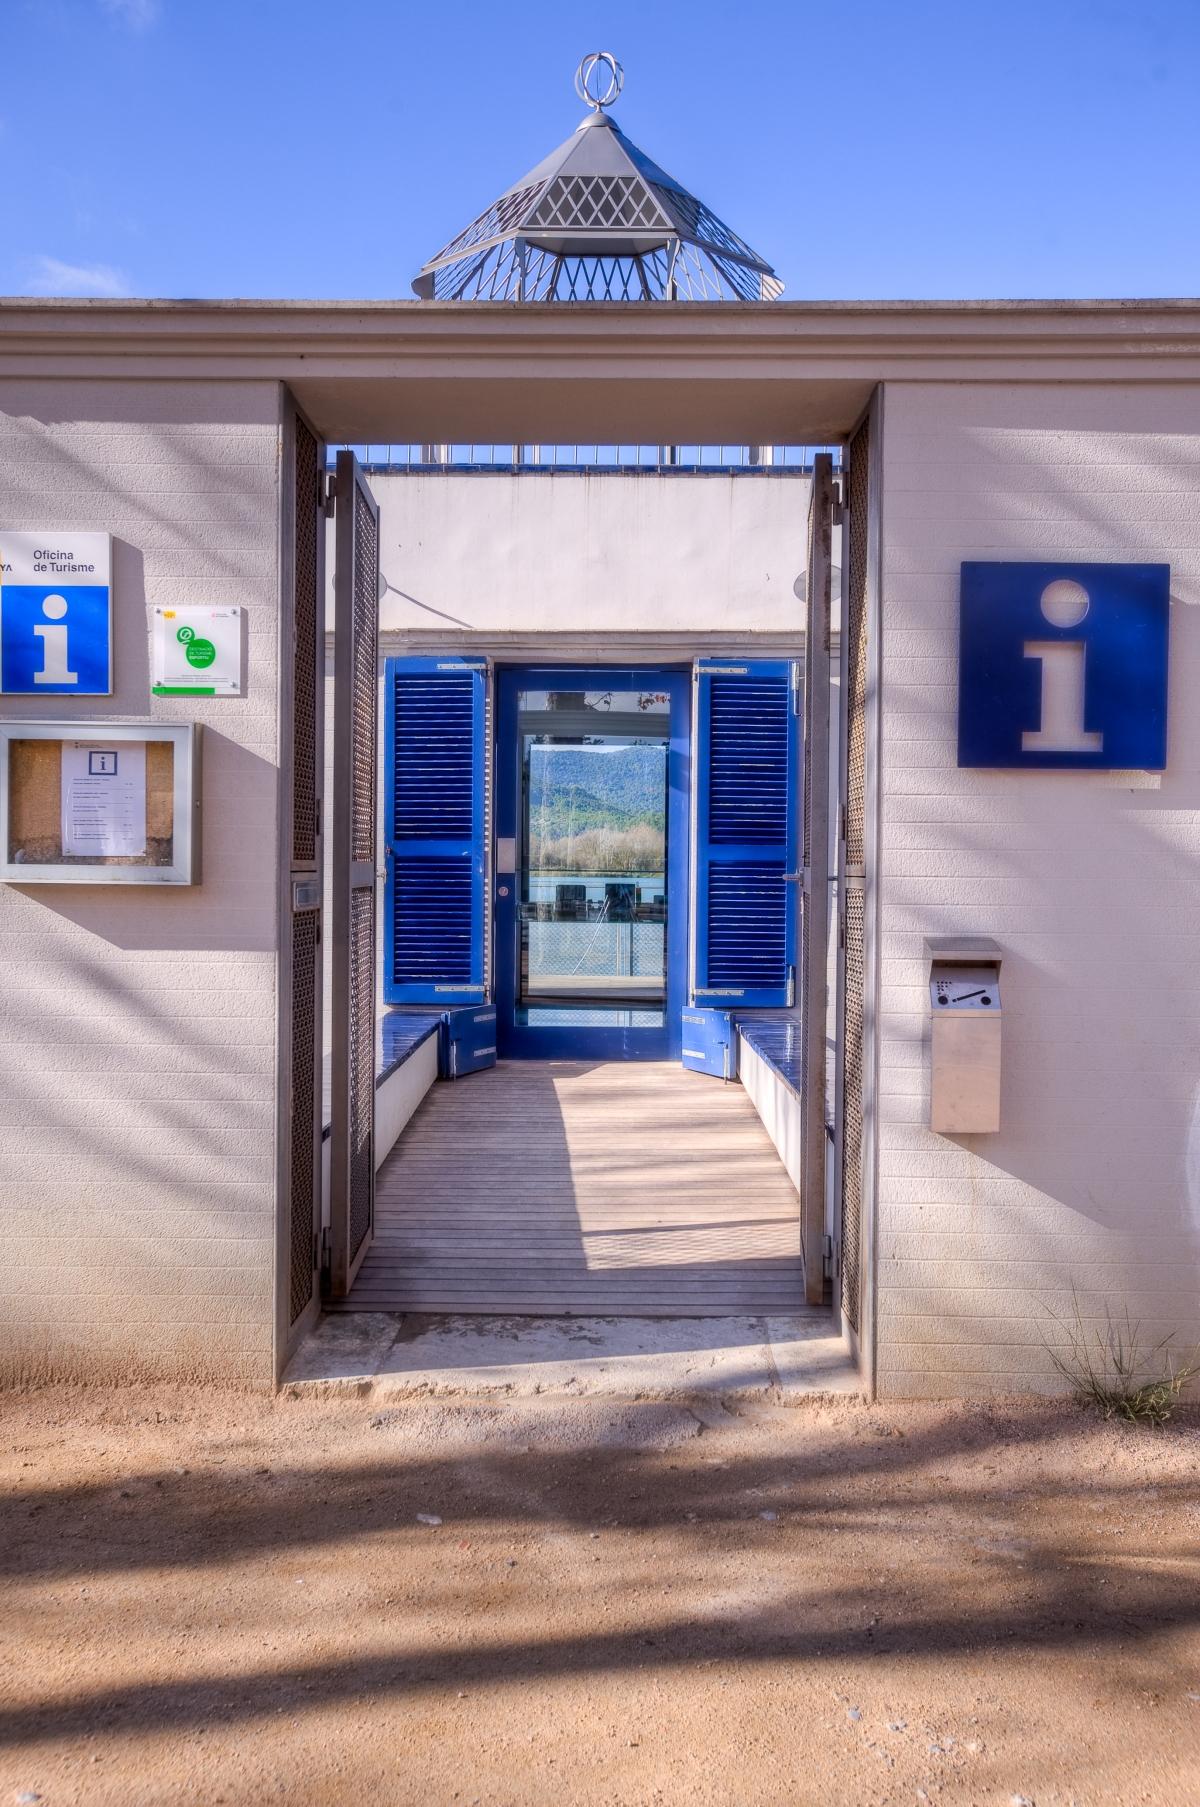 Oficina de turismo de l estany pesquera d en lero barcelona film commission - Oficina de turismo de barcelona ...